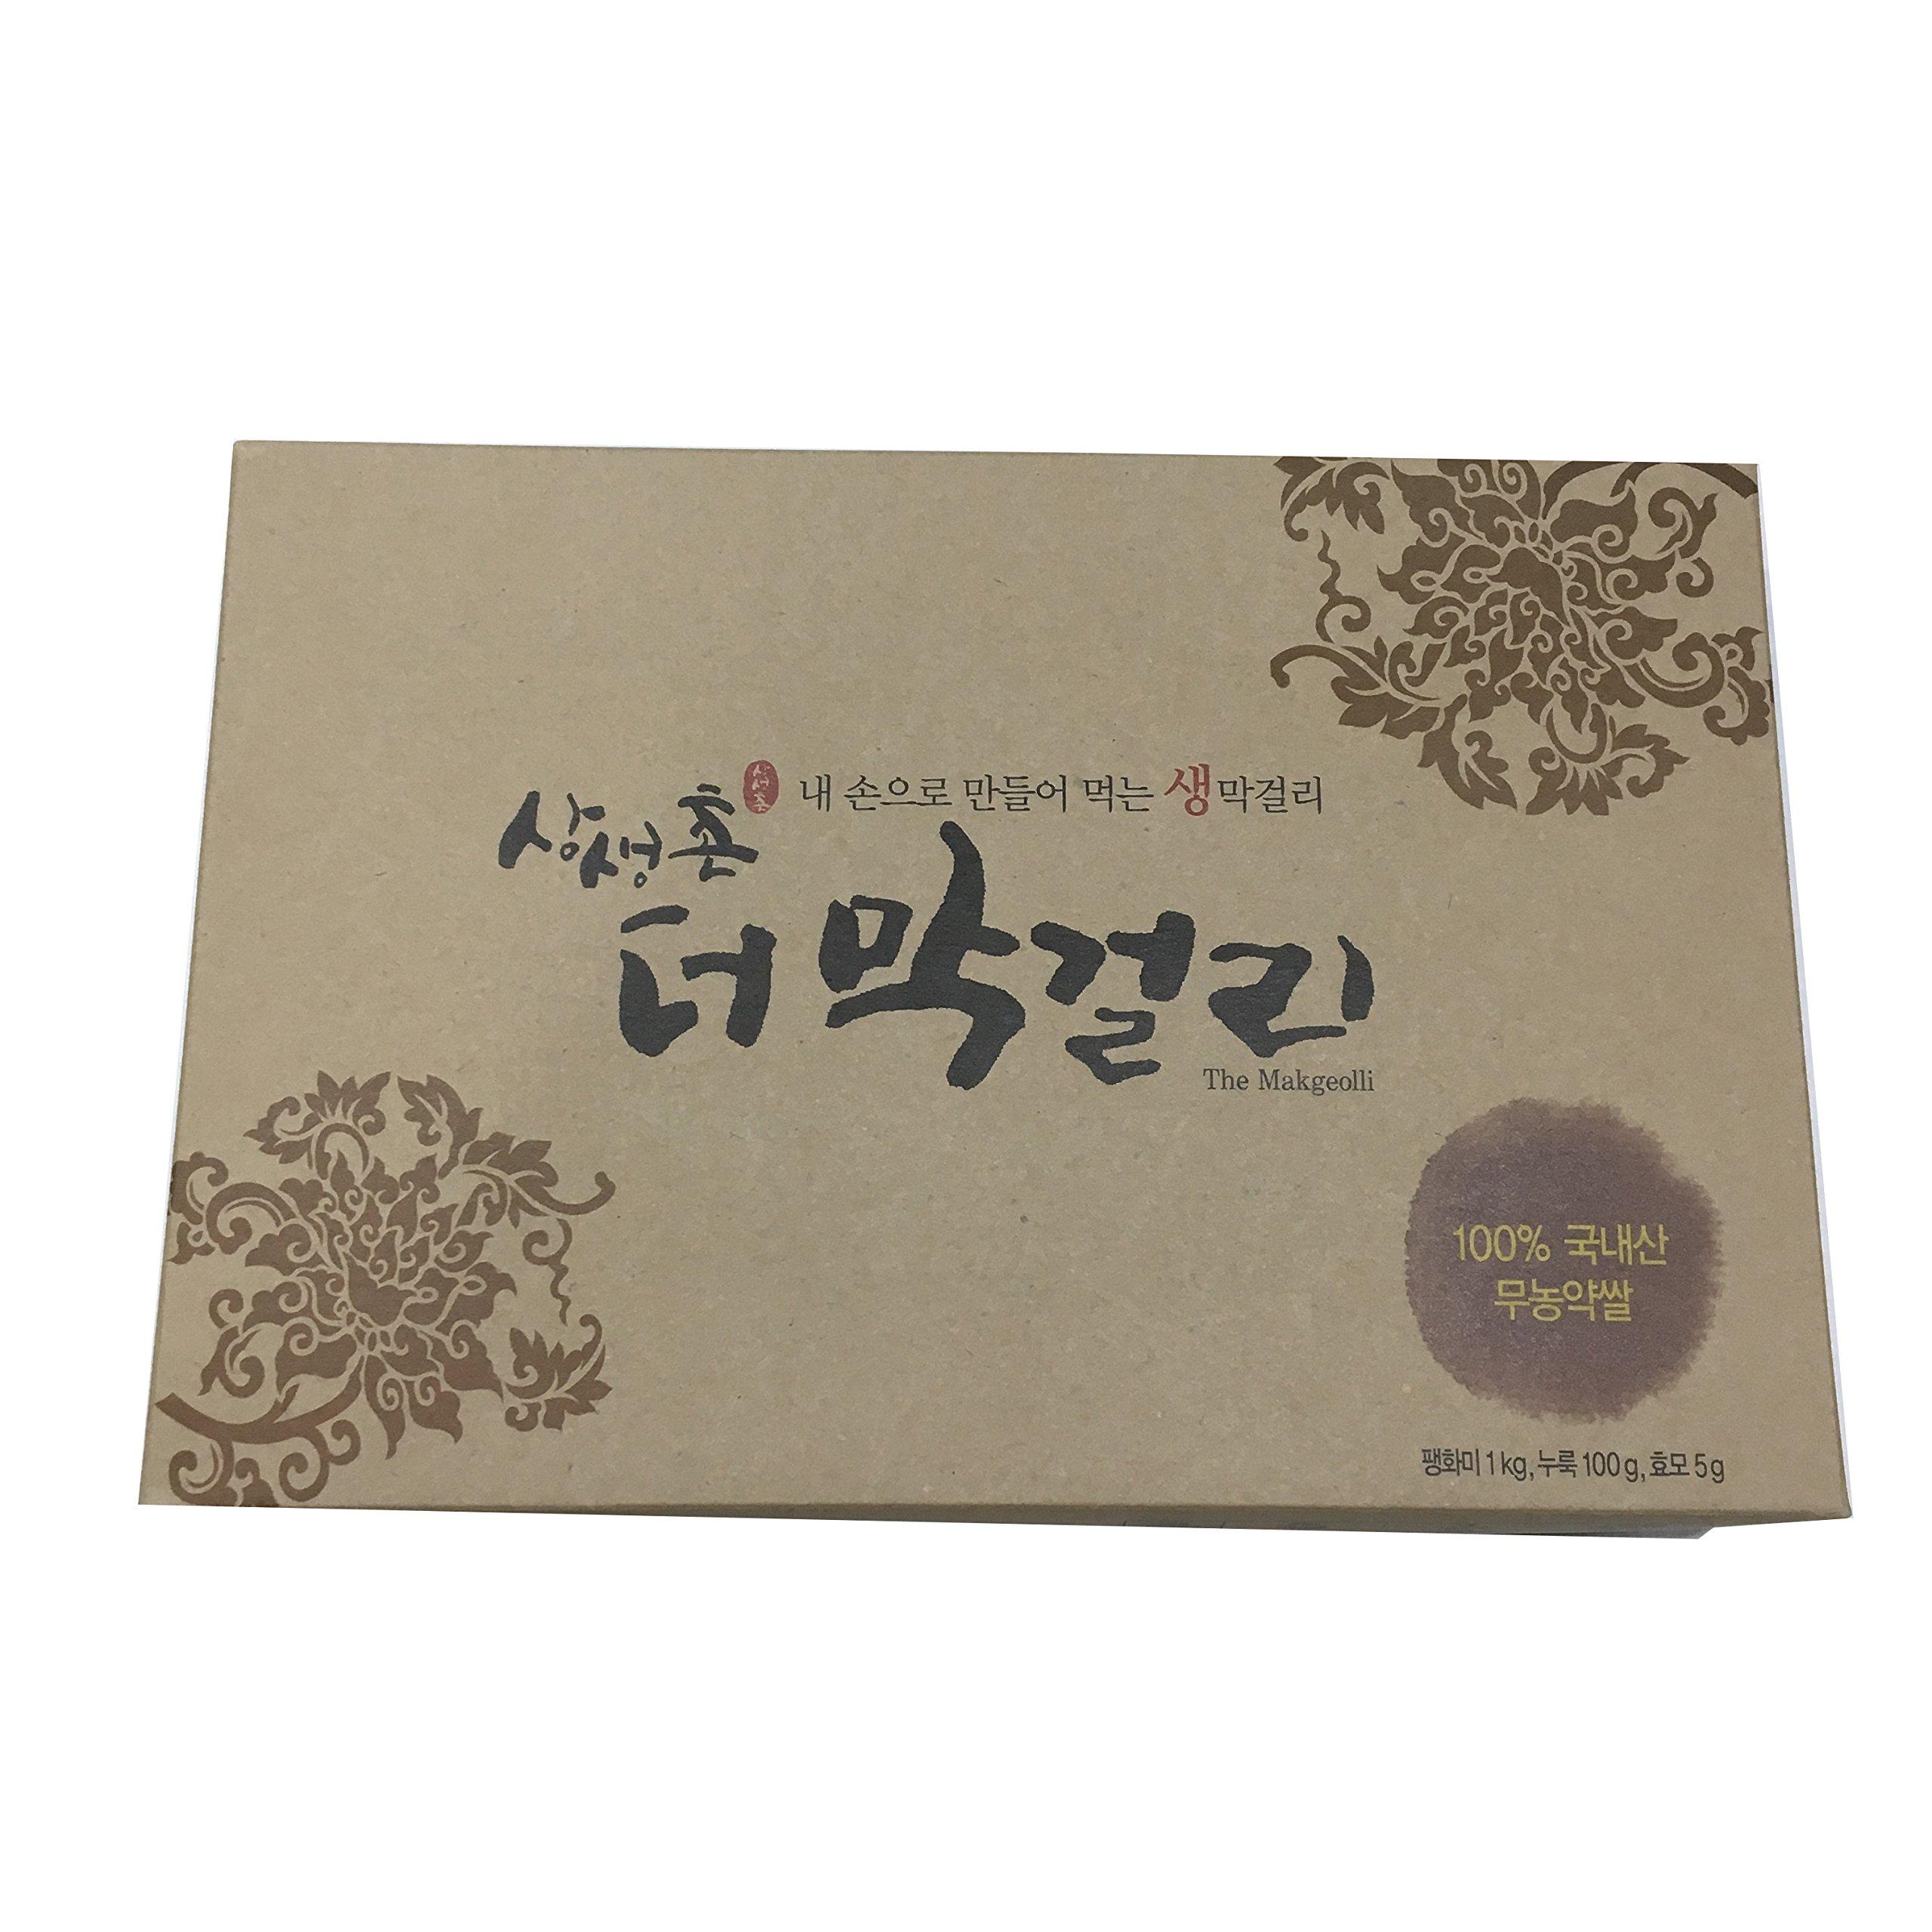 The Makgeolli Korean Traditional Organic Rice Wine Home Brewing DIY Kit 2.2lb by SangSaengChon (Image #2)